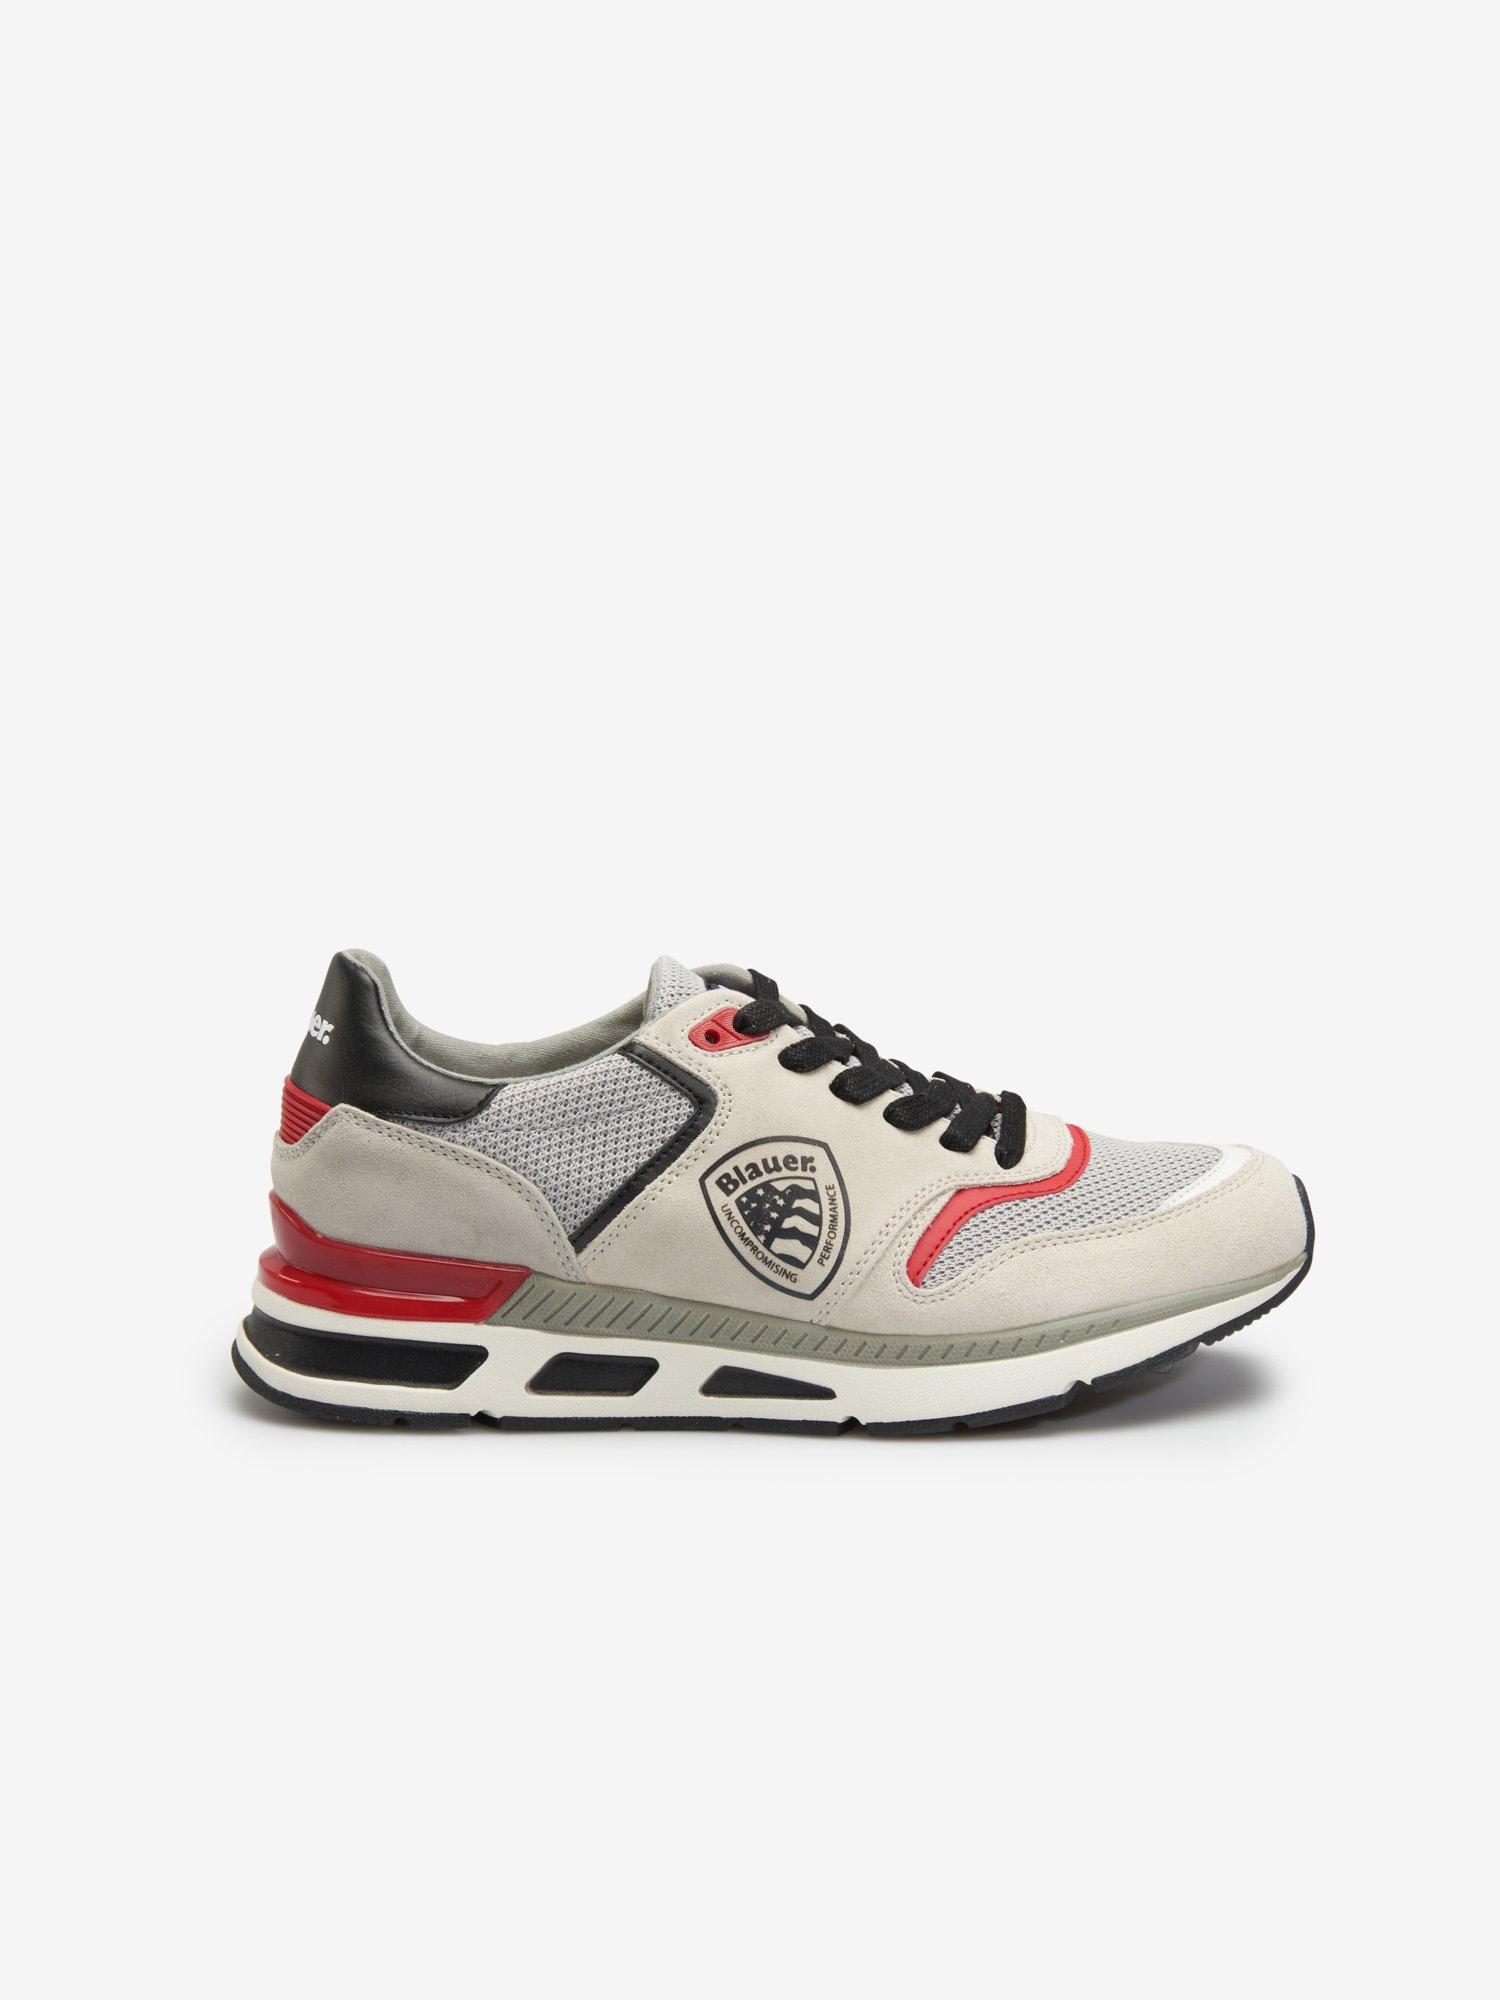 Hilo Sneakers man - Blauer